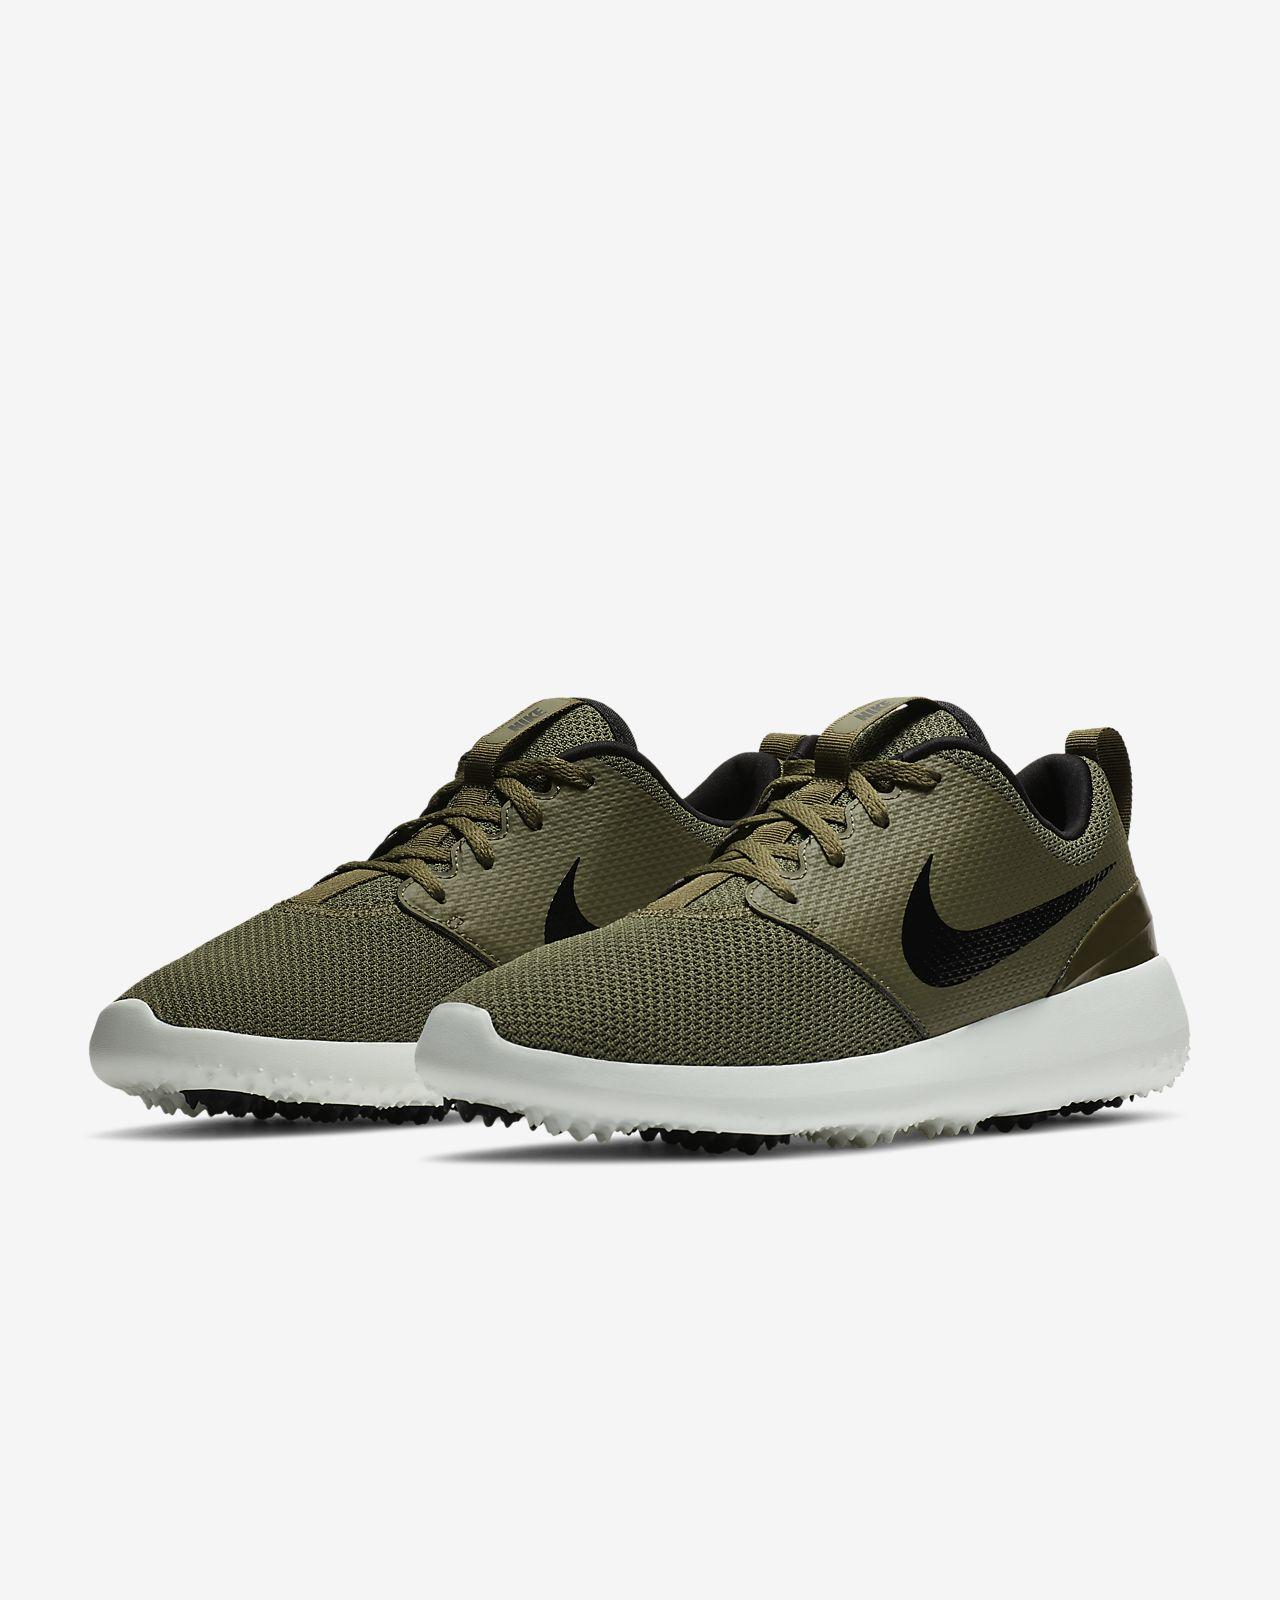 98174dc5925 Chaussure de golf Nike Roshe G pour Homme. Nike.com FR